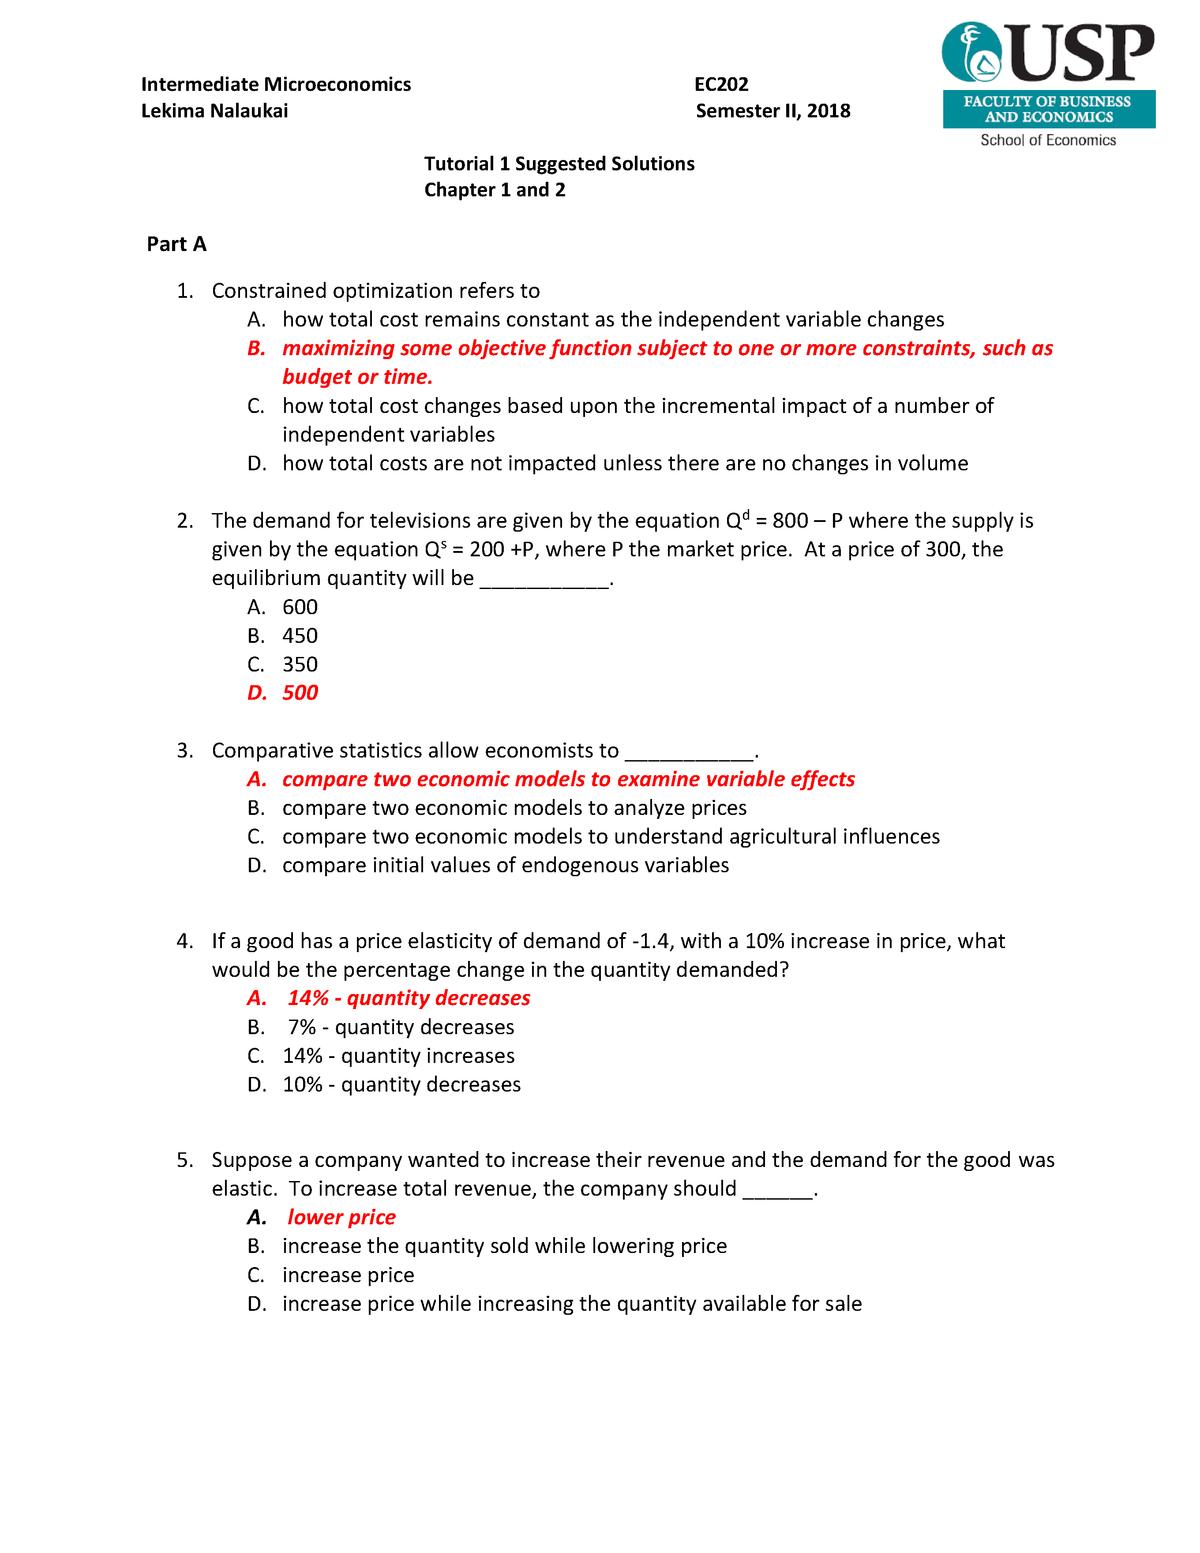 Tutorial 1 Suggested Solutions - StuDocu